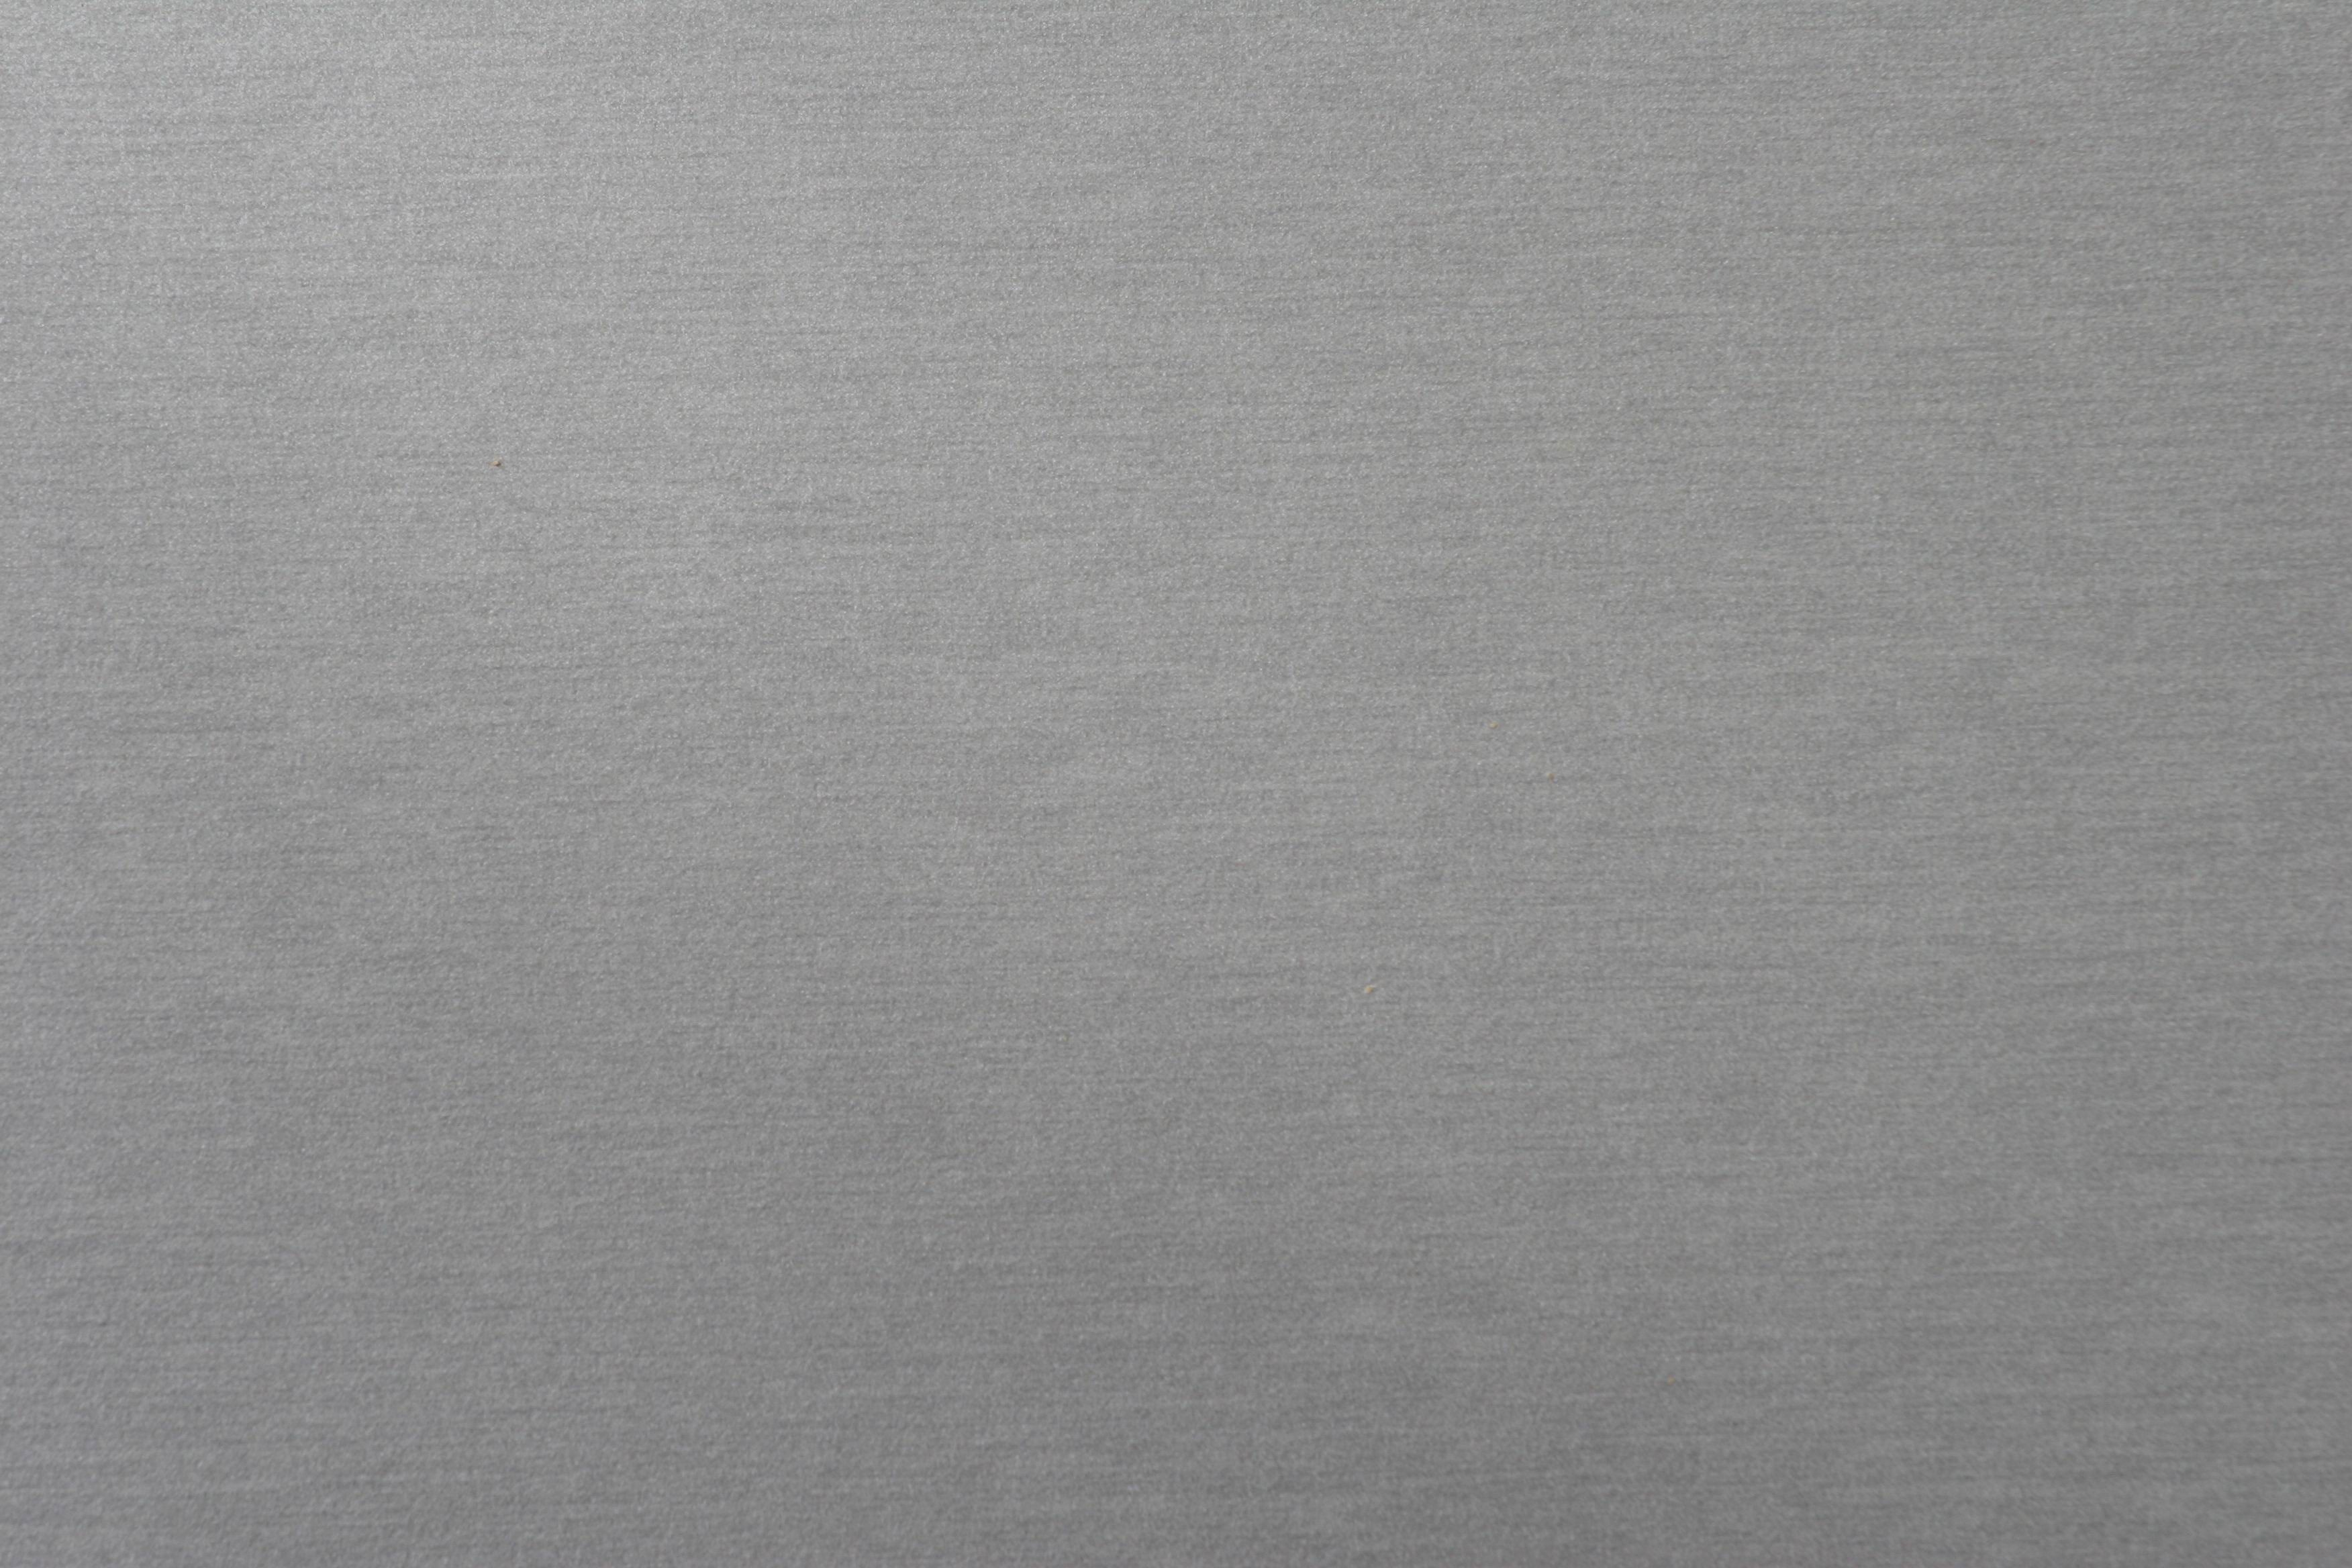 Aluminum Wallpaper Download Desktop Images Background Photos 3504x2336